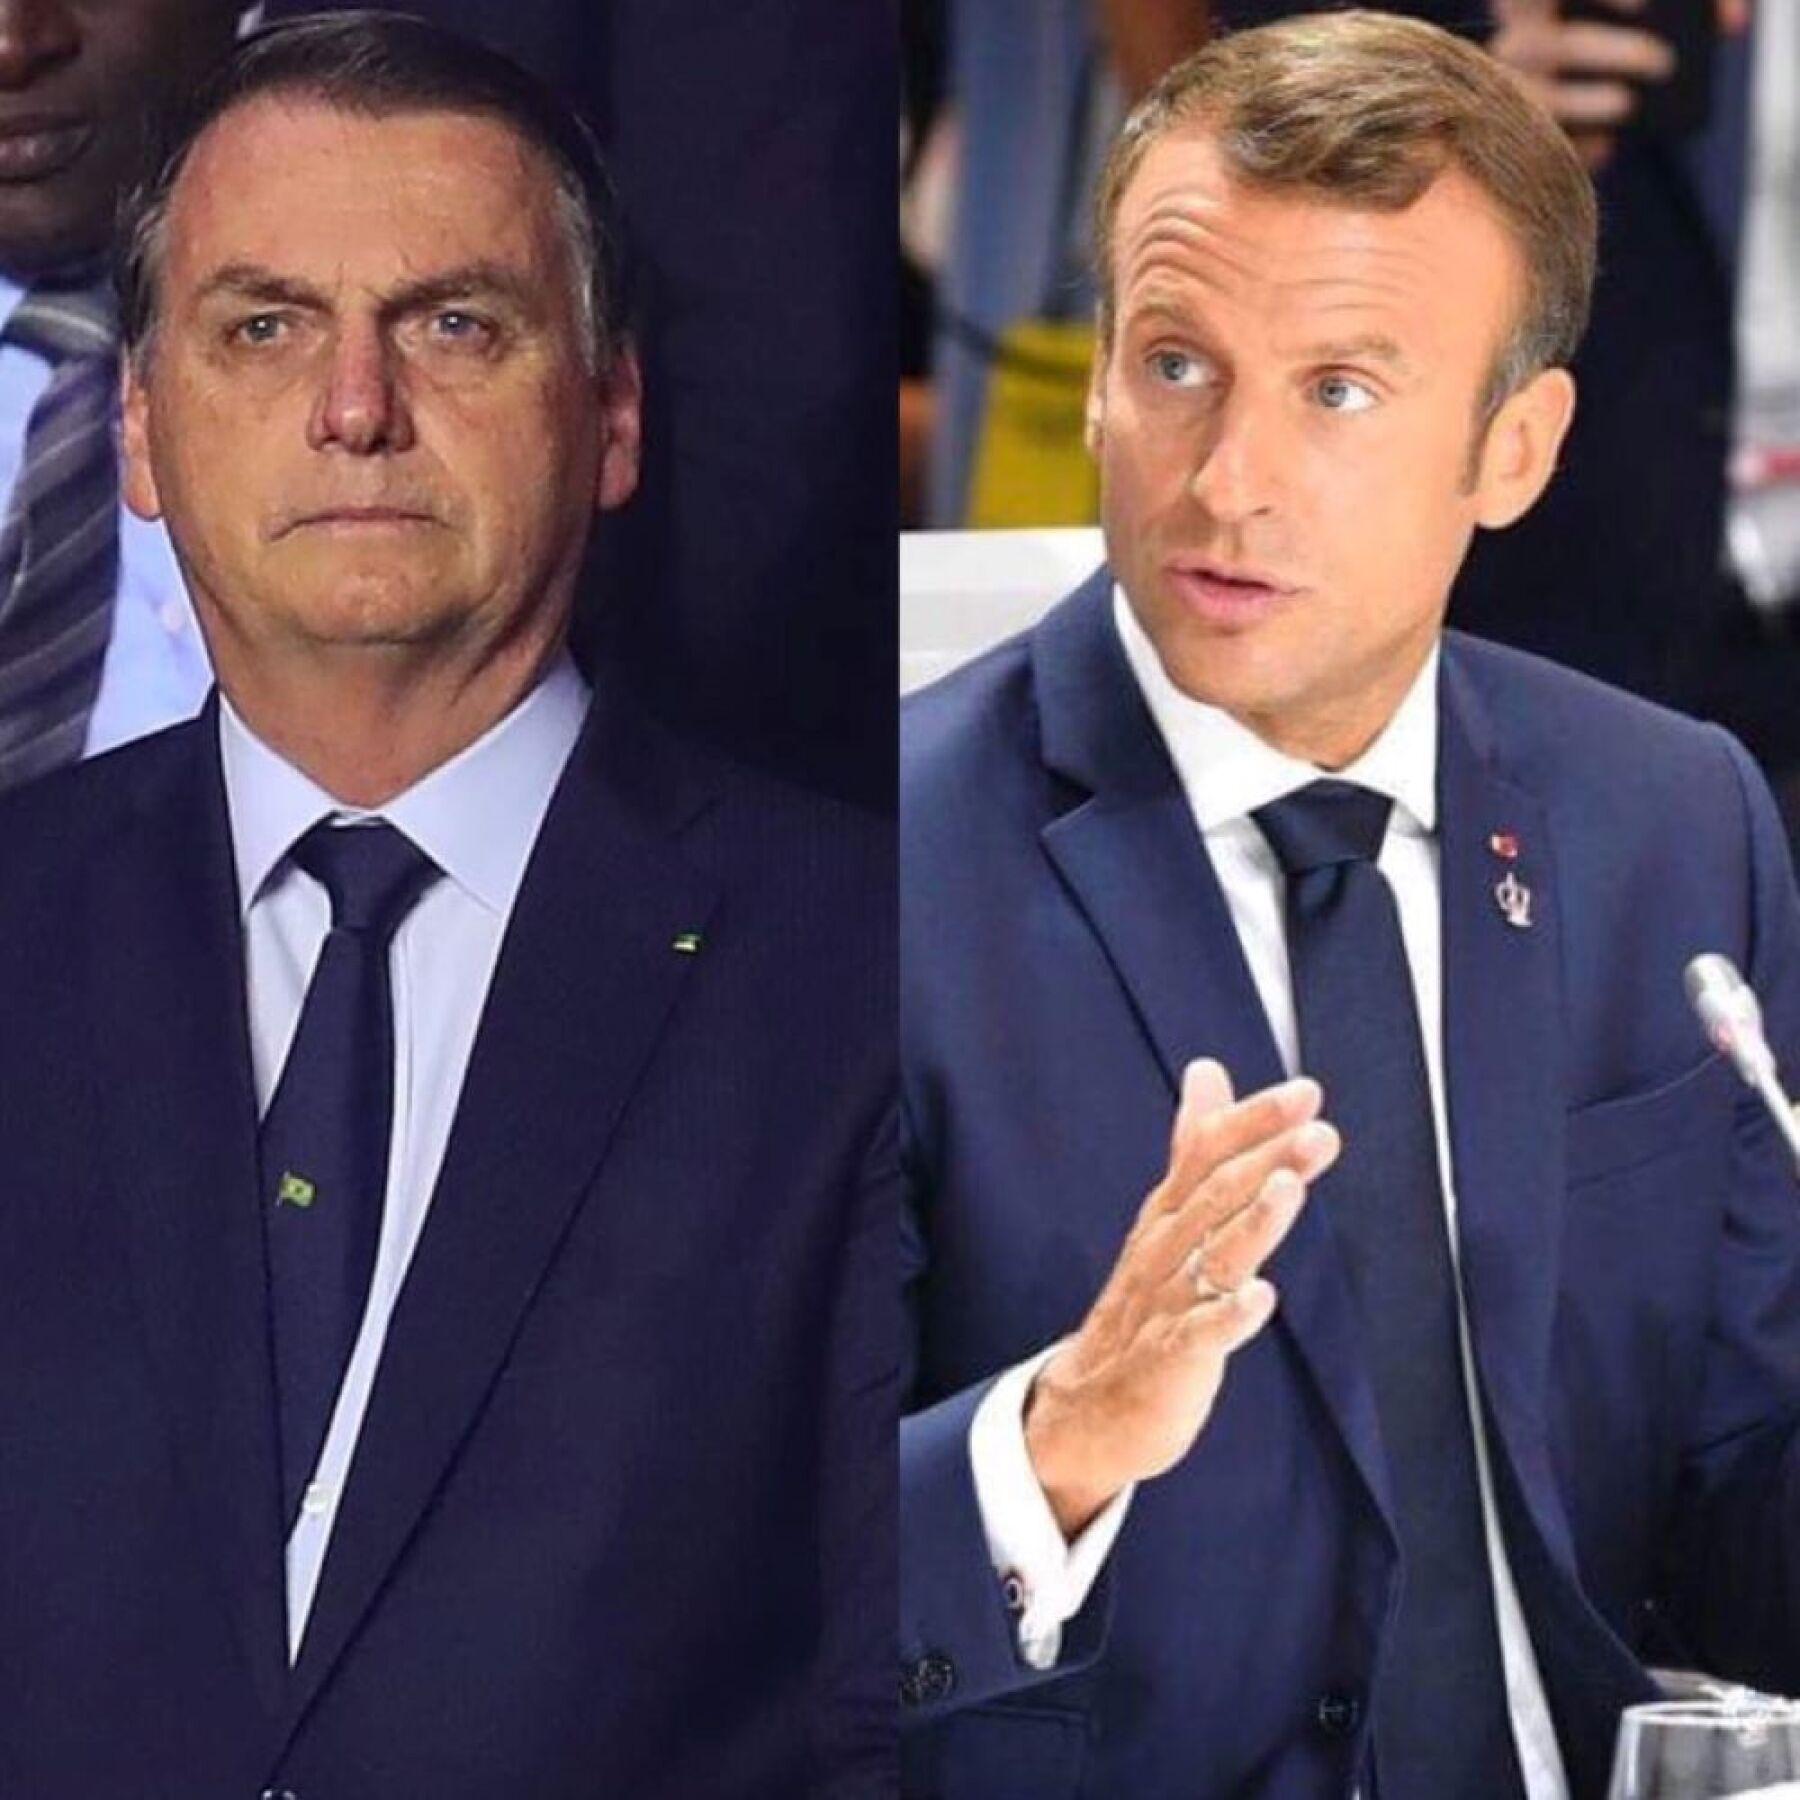 Emmanuel Macron contra Jair Bolsonaro 1.jpg